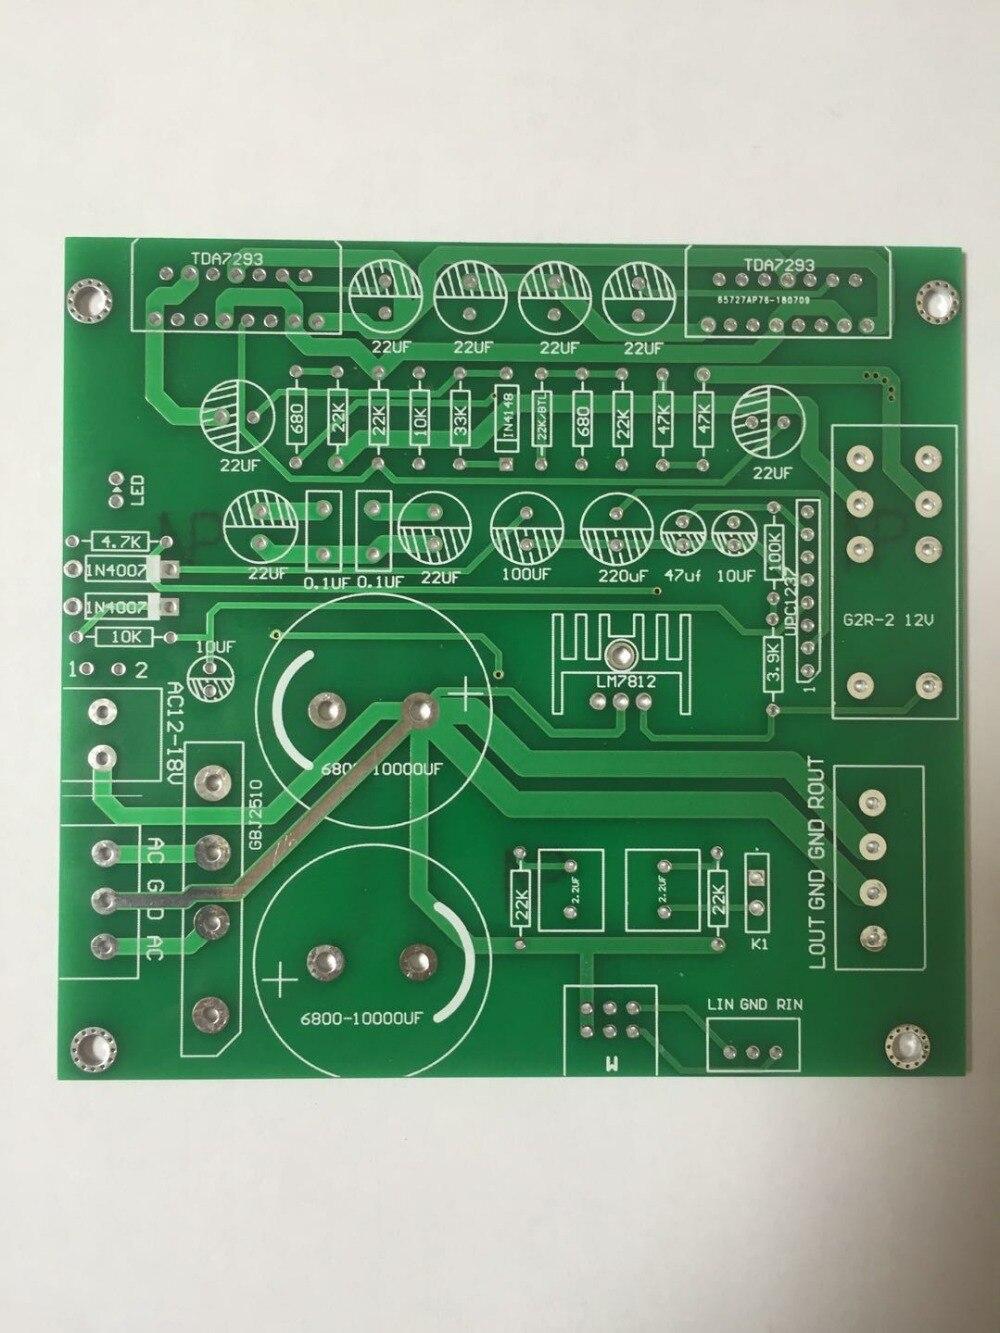 NEW GENUINE ST TDA7293 TDA 7293 Audio Amp ICs audio amplifier chip Gut